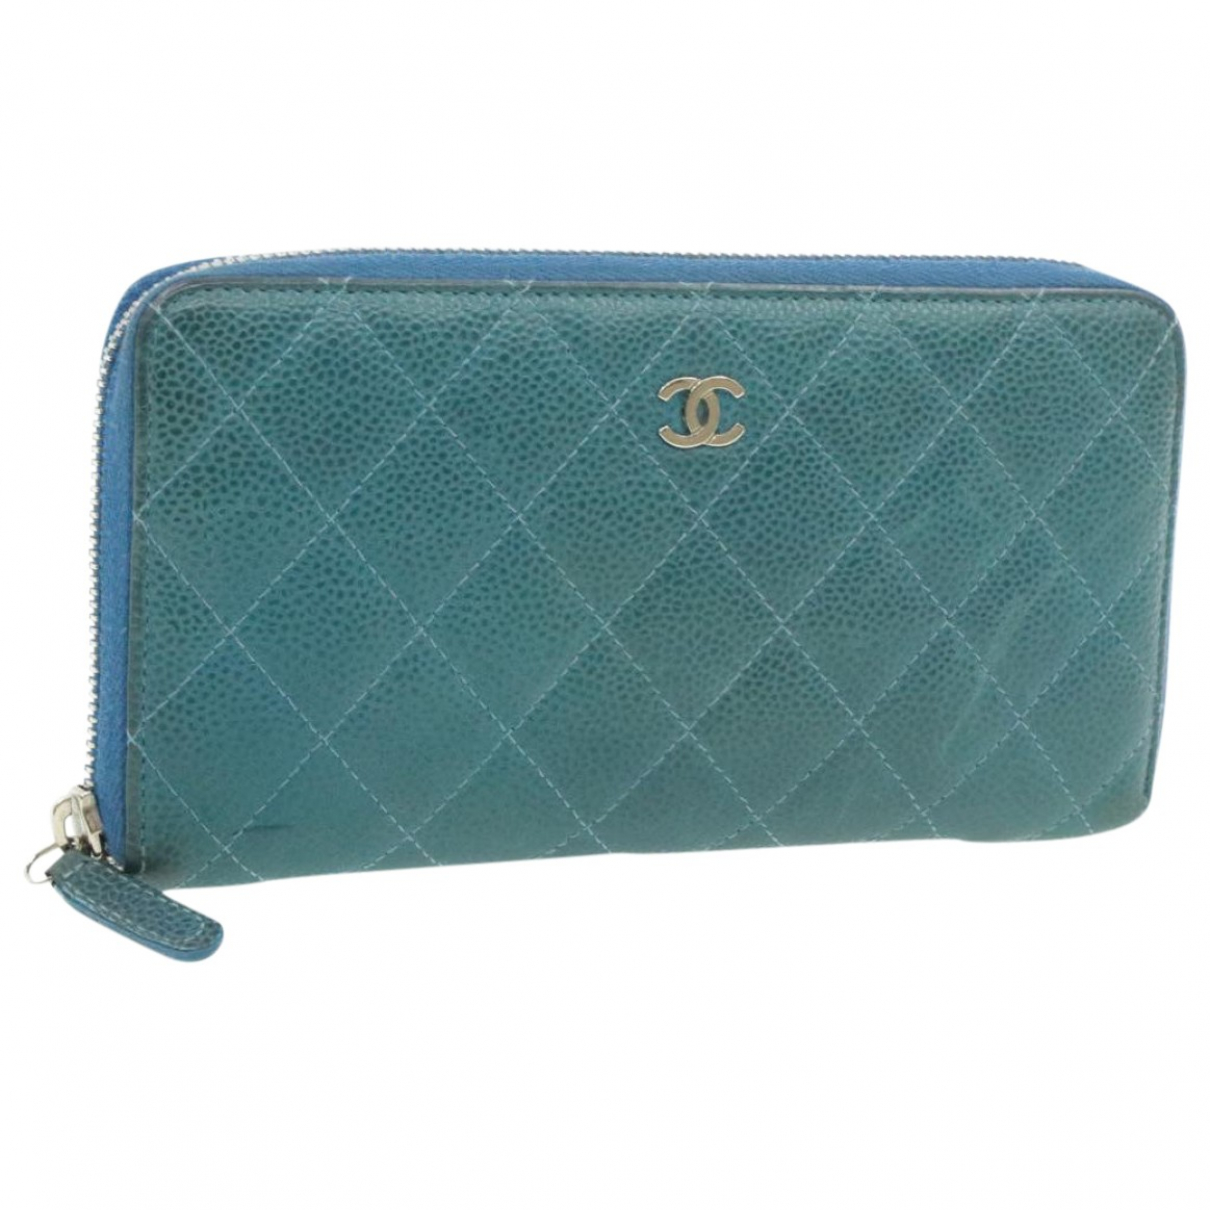 Chanel - Foulard   pour femme - bleu